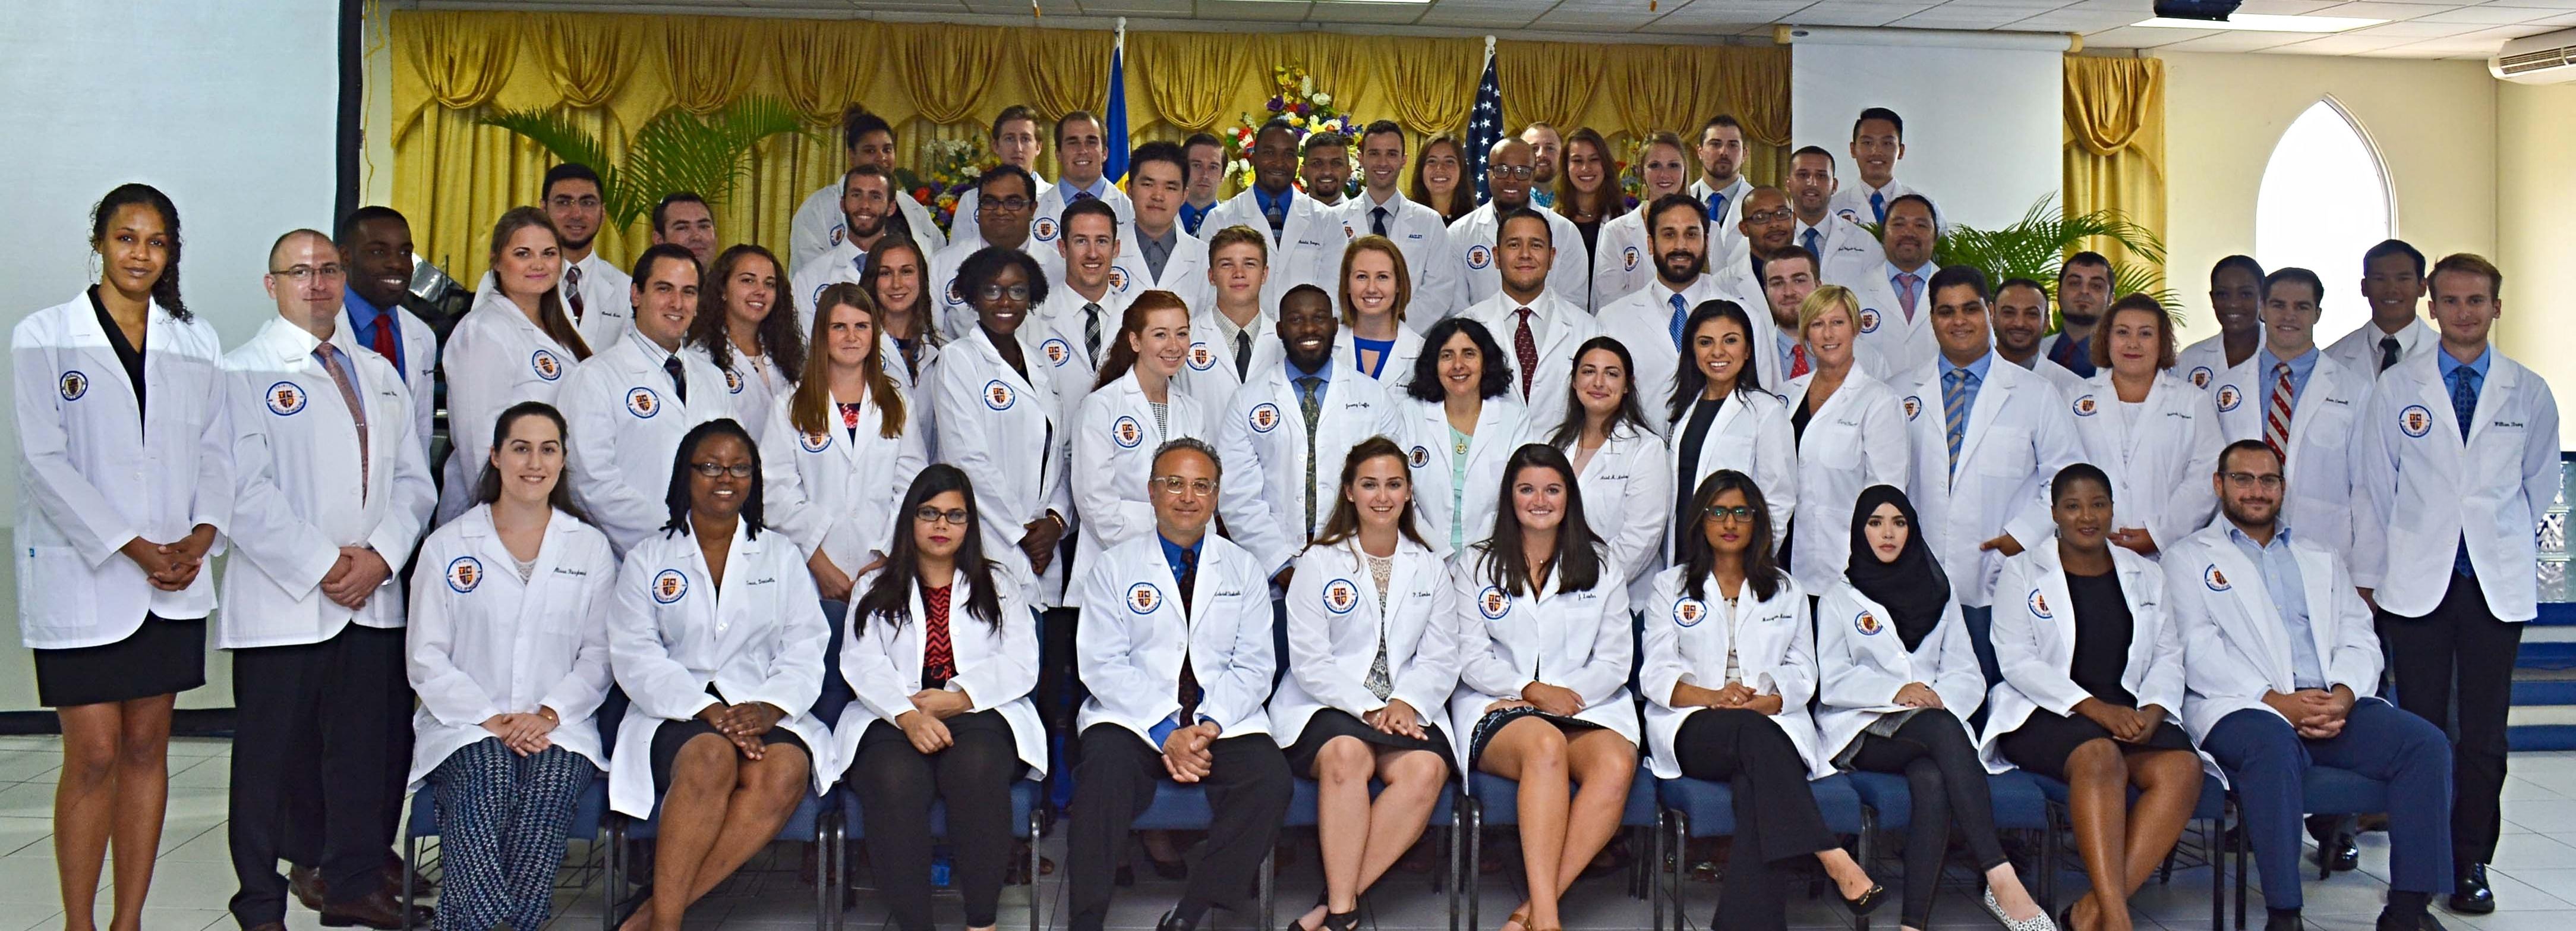 Trinity School of Medicine Holds September 2017 White Coat Ceremony